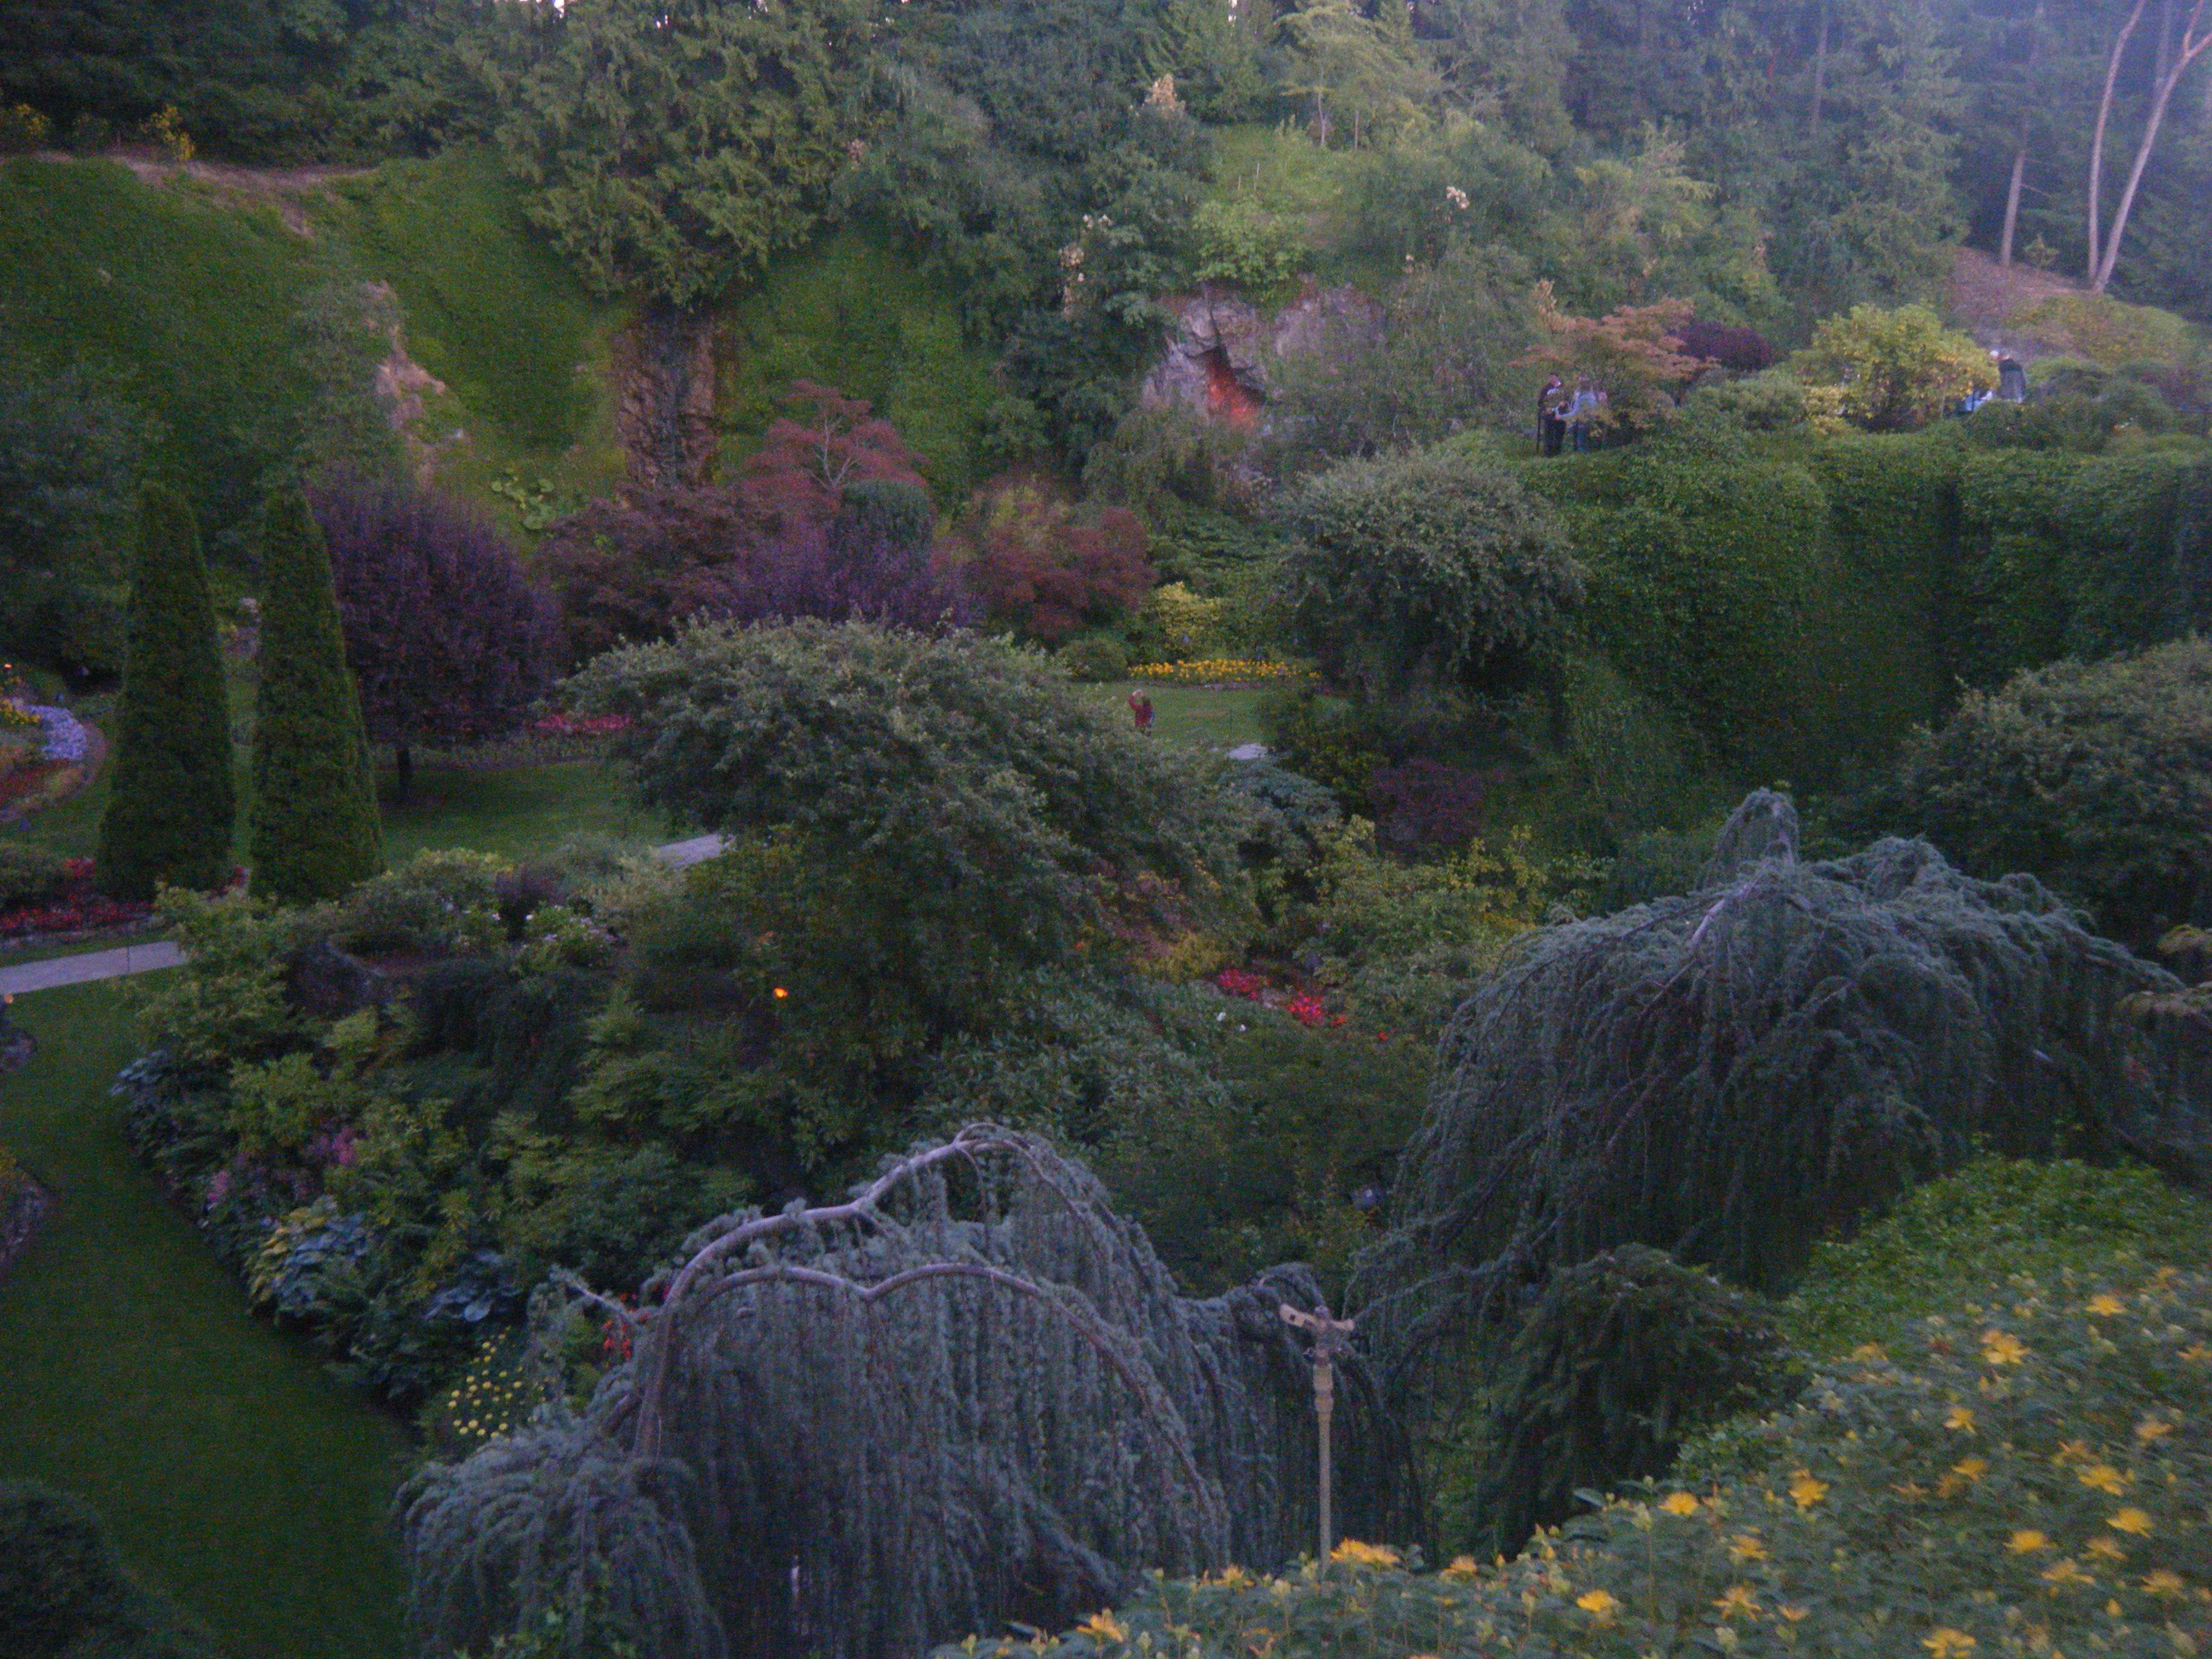 a visit to butchart gardens hortophile u2013 my new garden